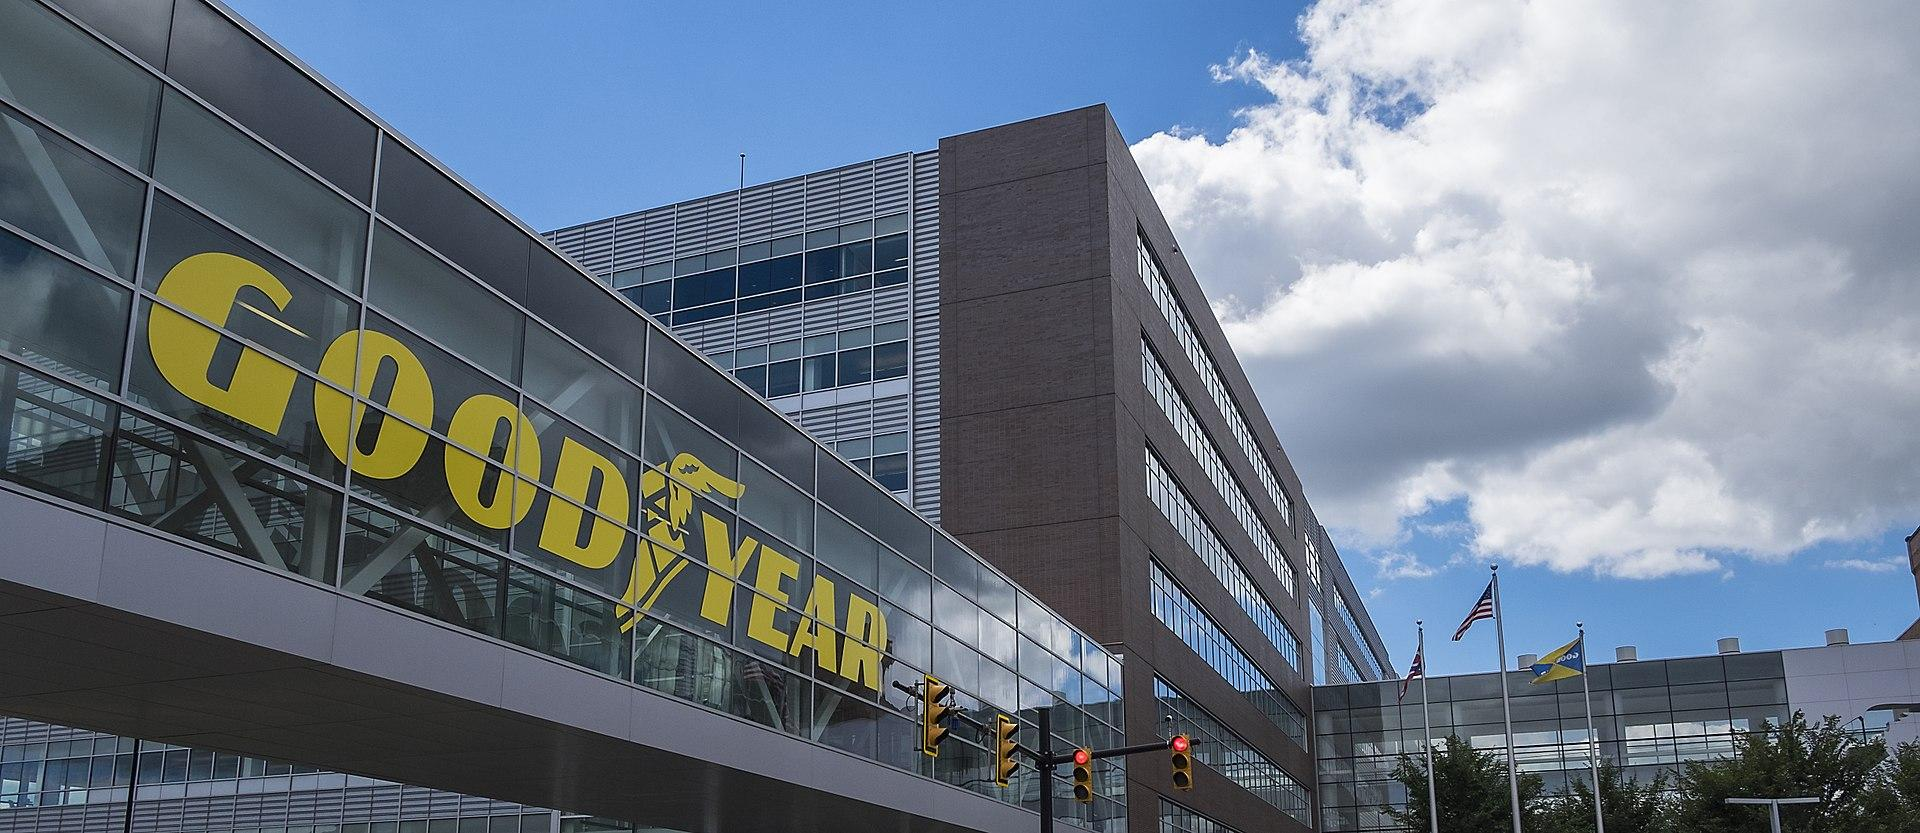 Kantor pusat Goodyear di Akron, Ohio